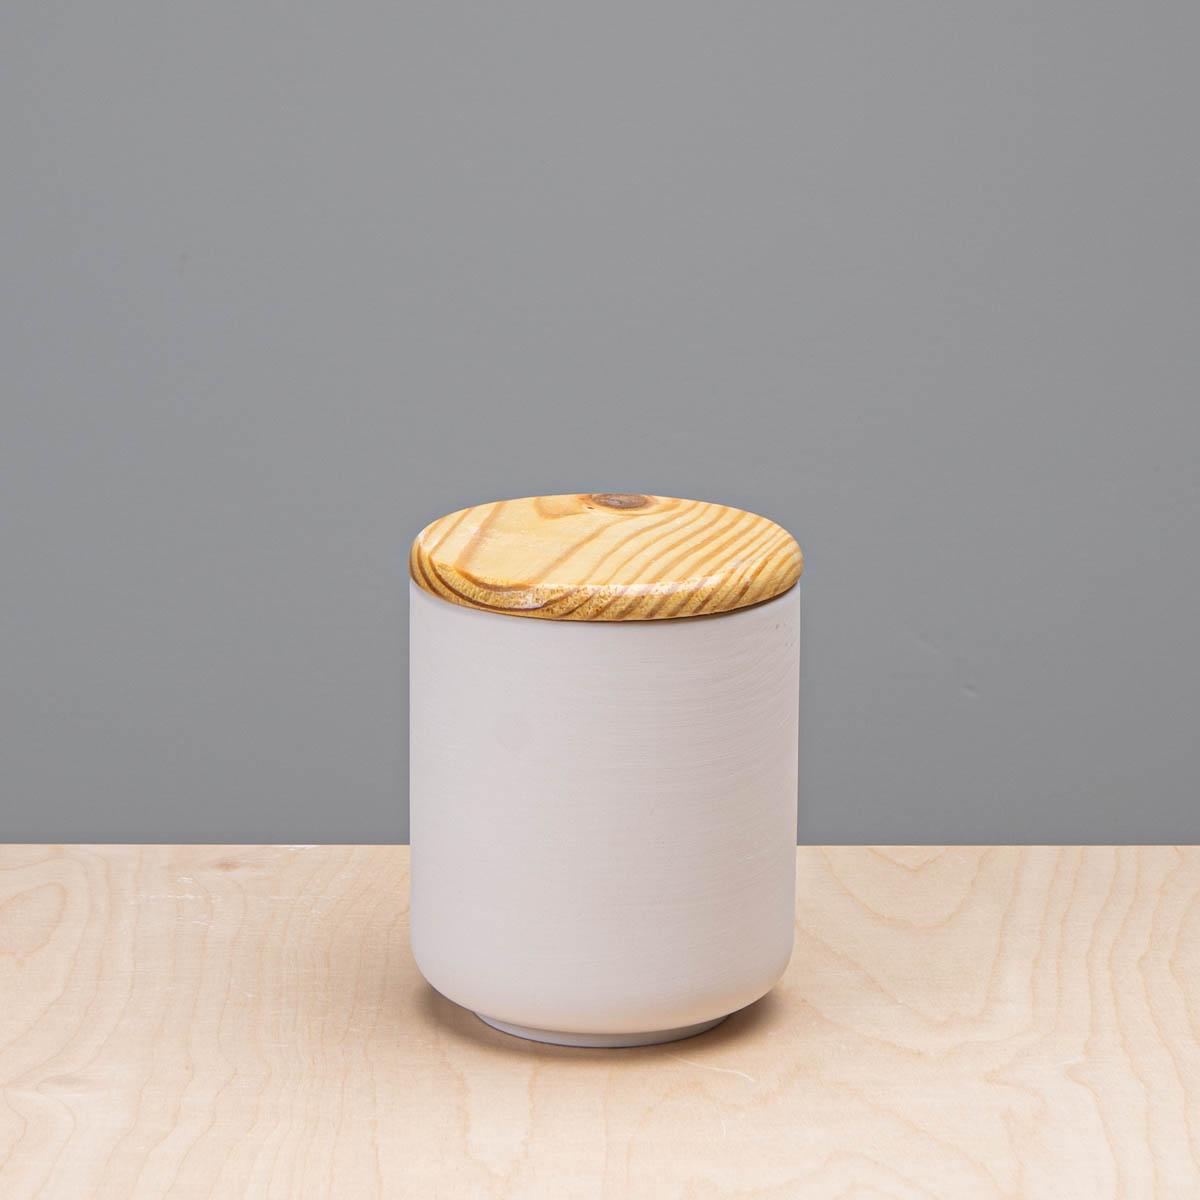 keramikpost-produkt-173